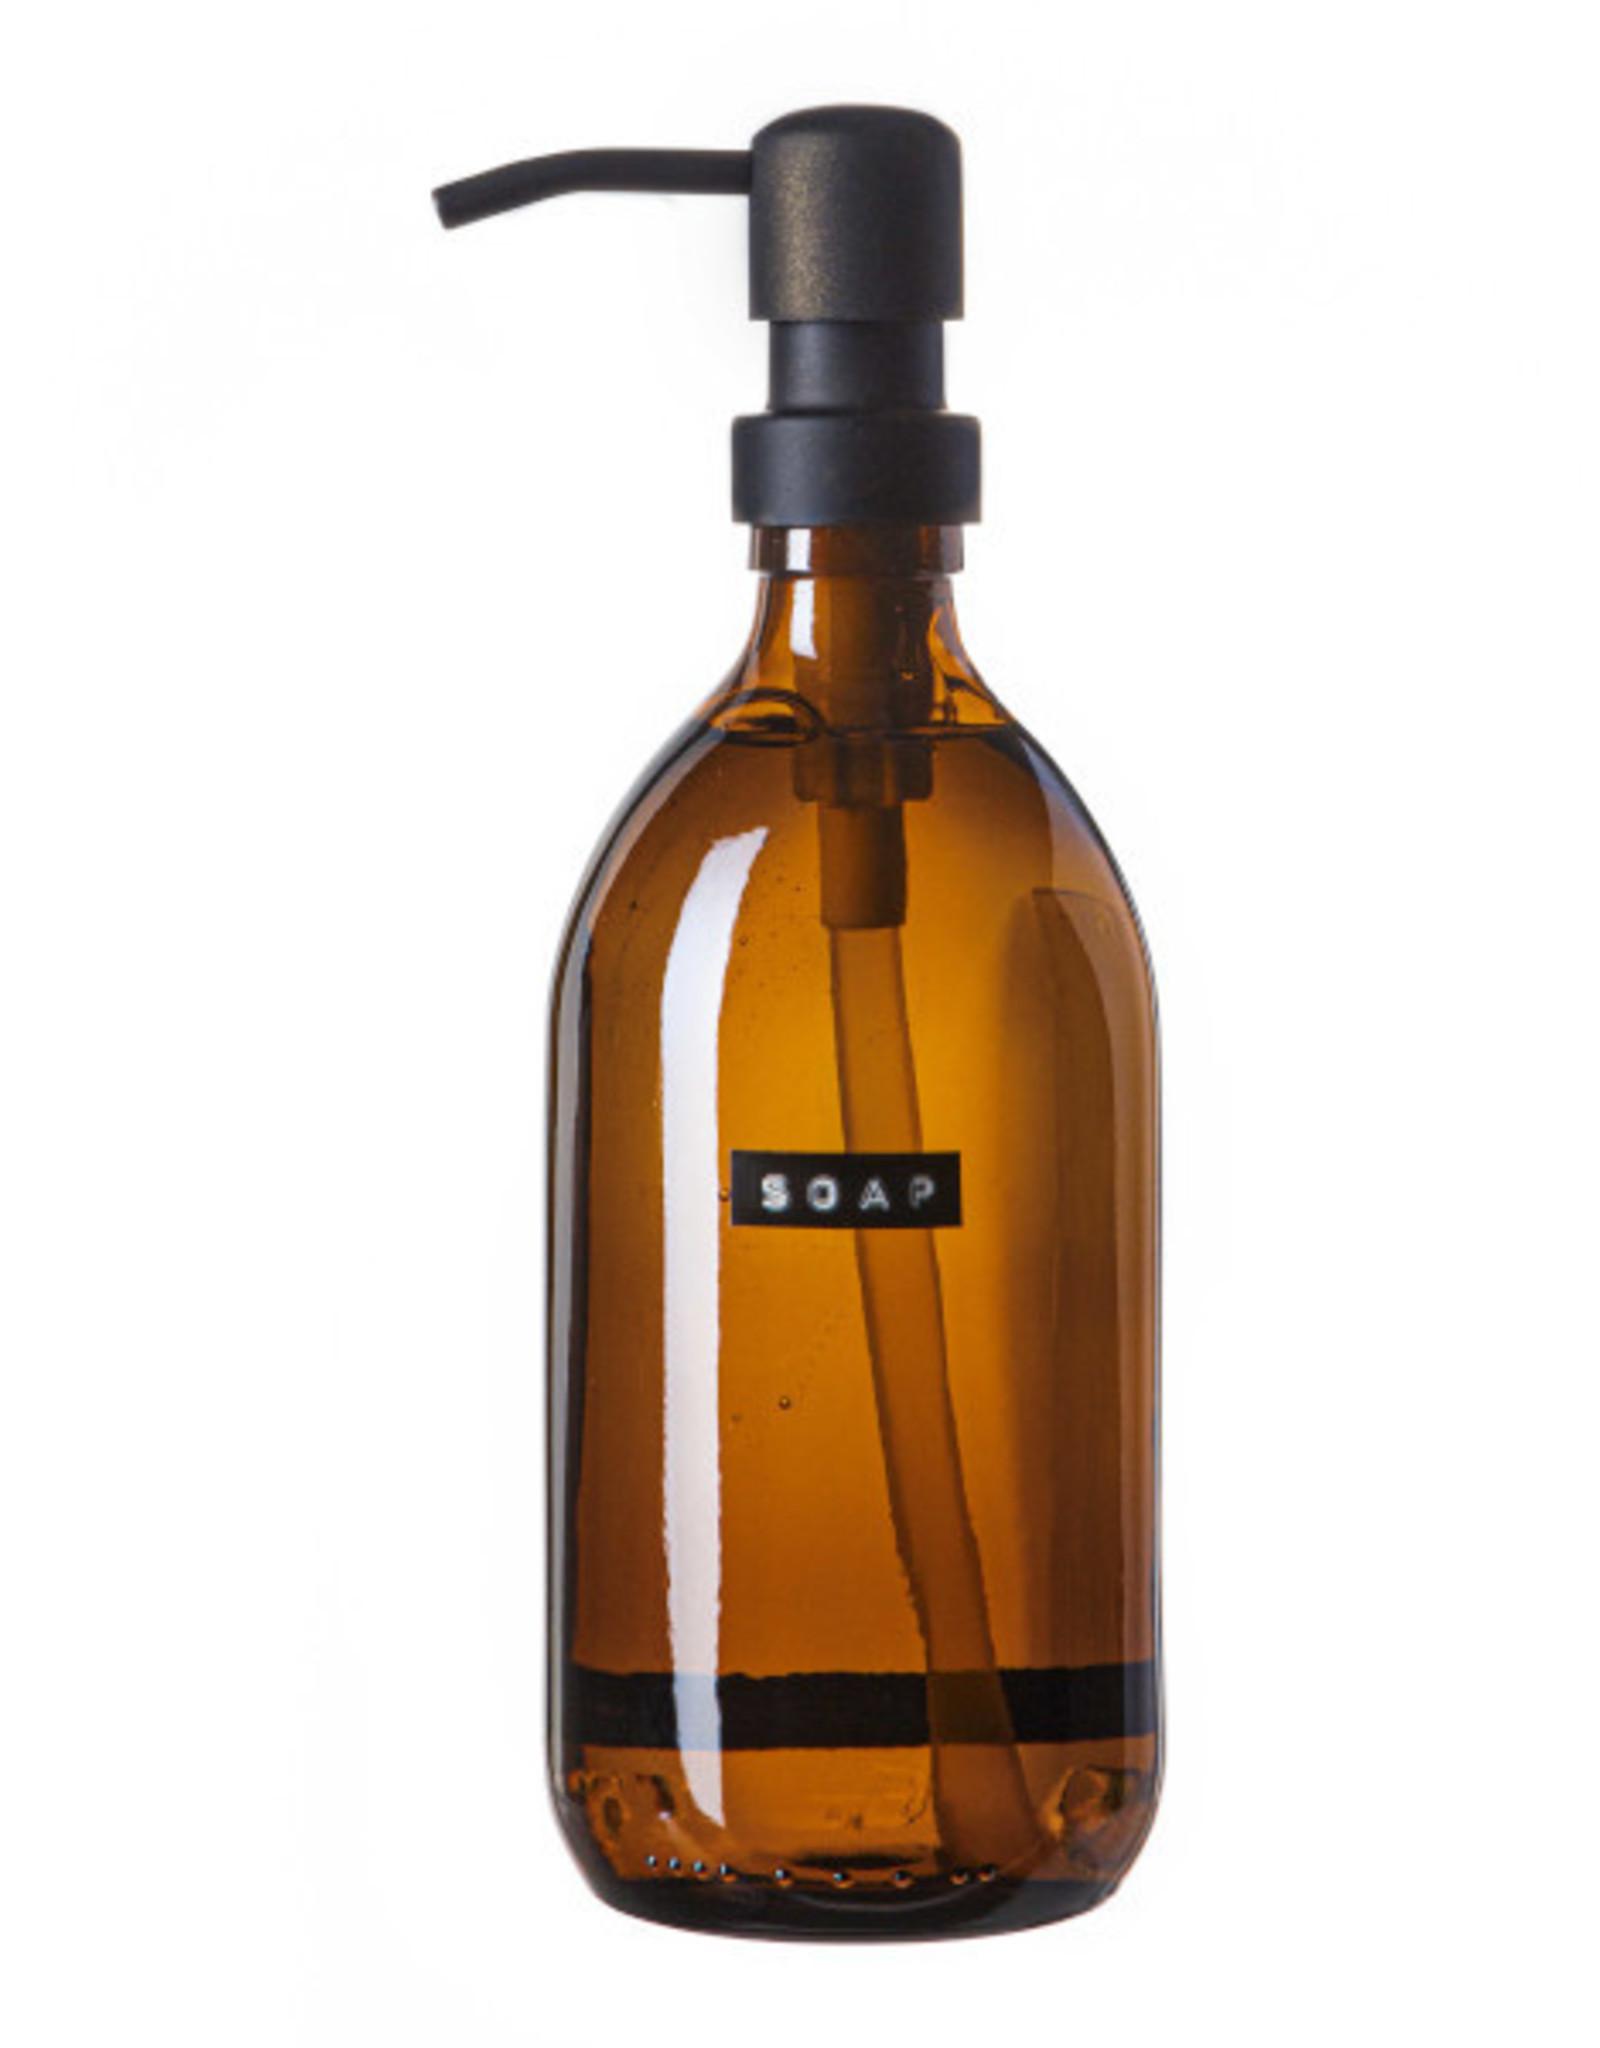 wellmark Wellmark Zeeppomp bruin glas - zwart - 500ml handzeep bamboe - Soap